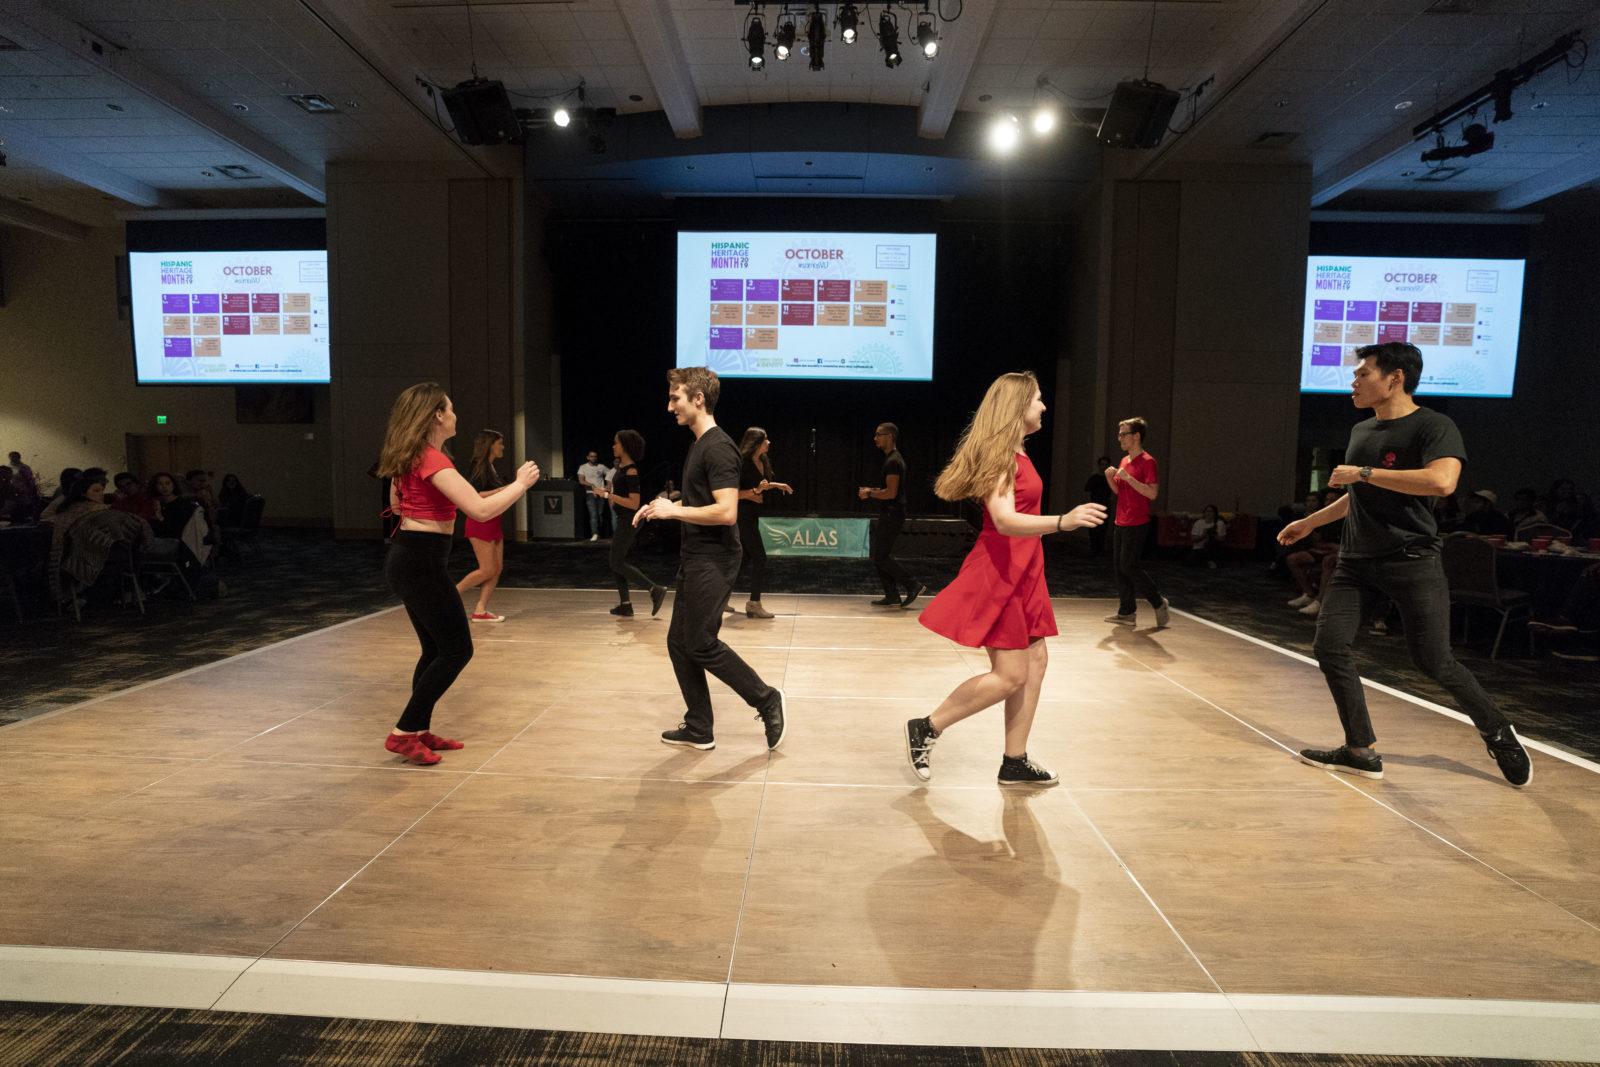 Students dancing at Sabor Latino (Joe Howell/Vanderbilt University)